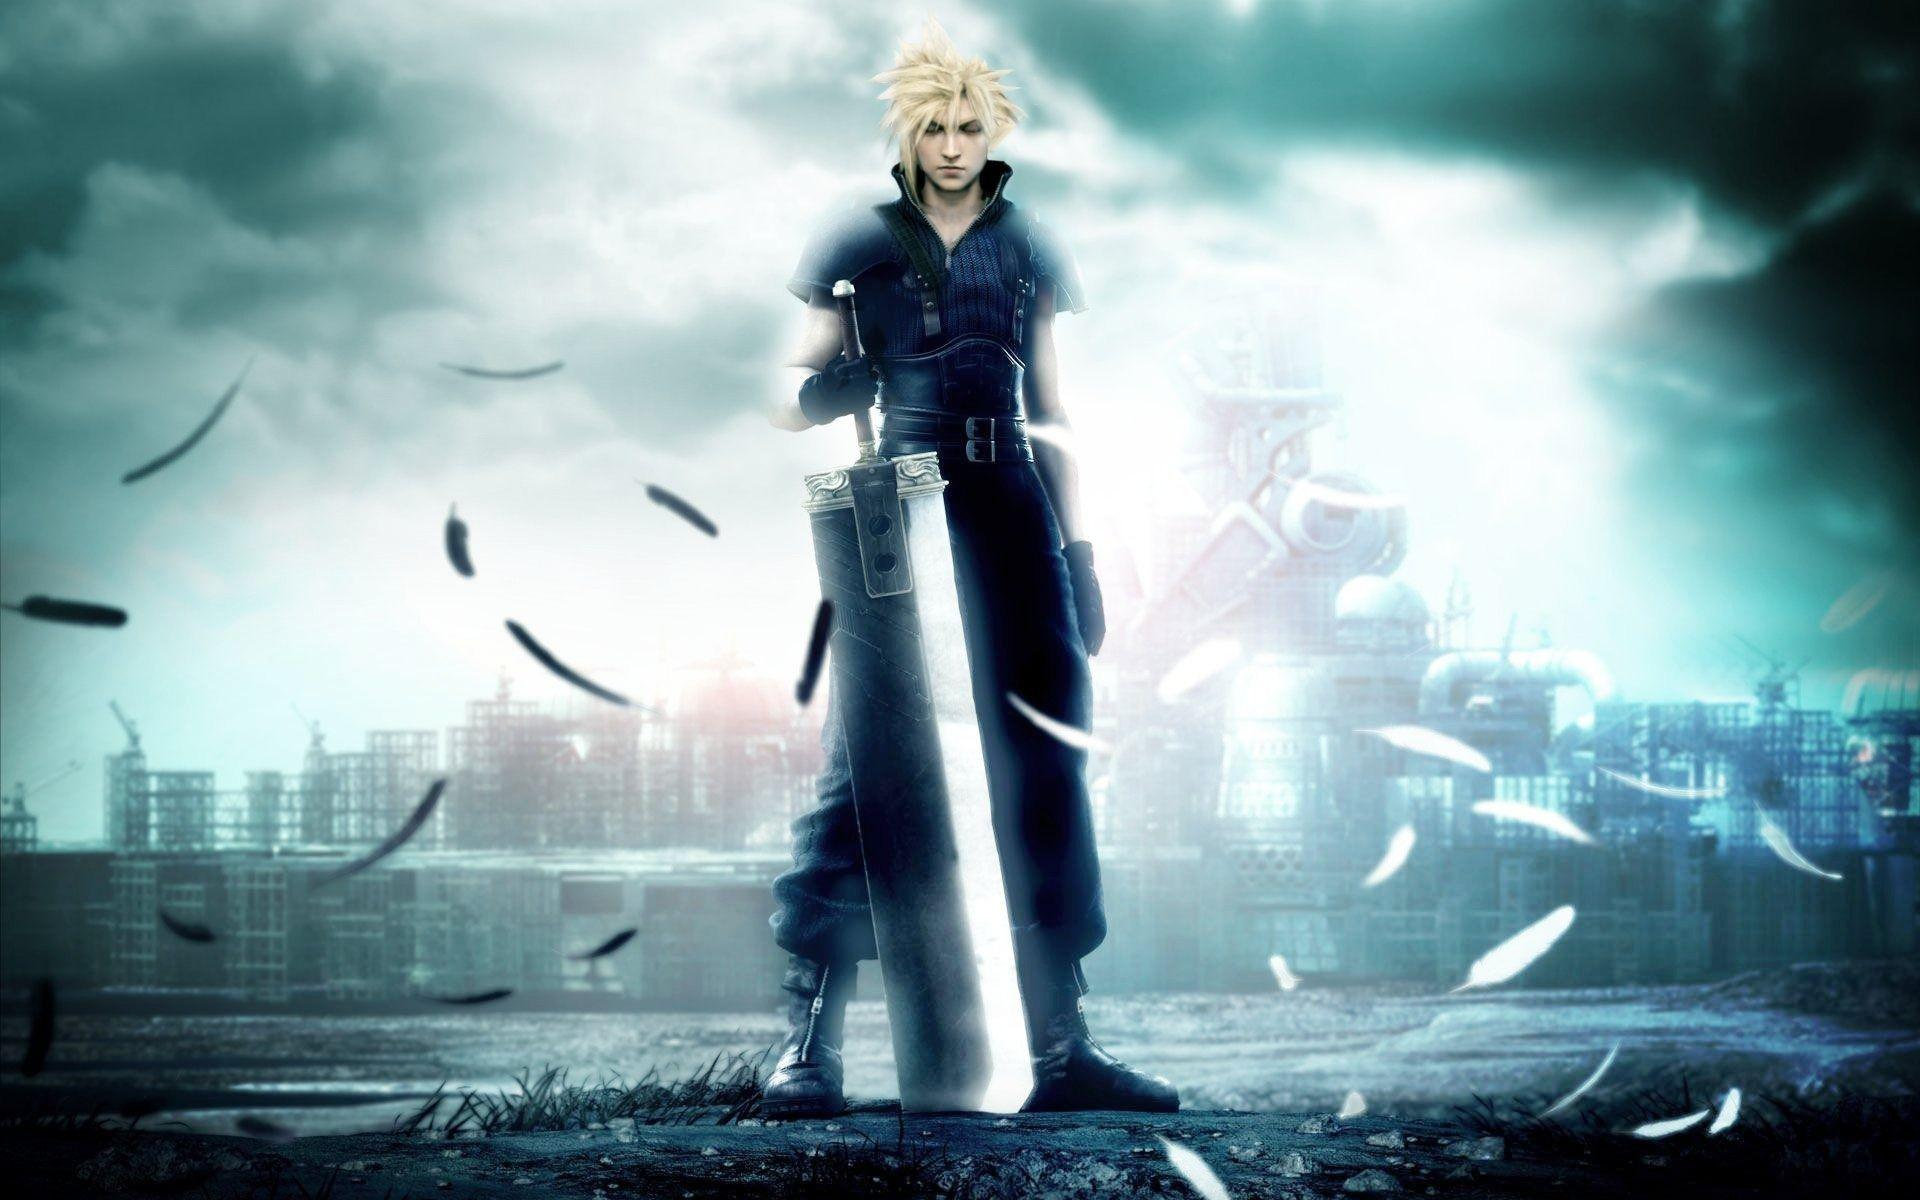 Top Final Fantasy Wallpaper Ideas